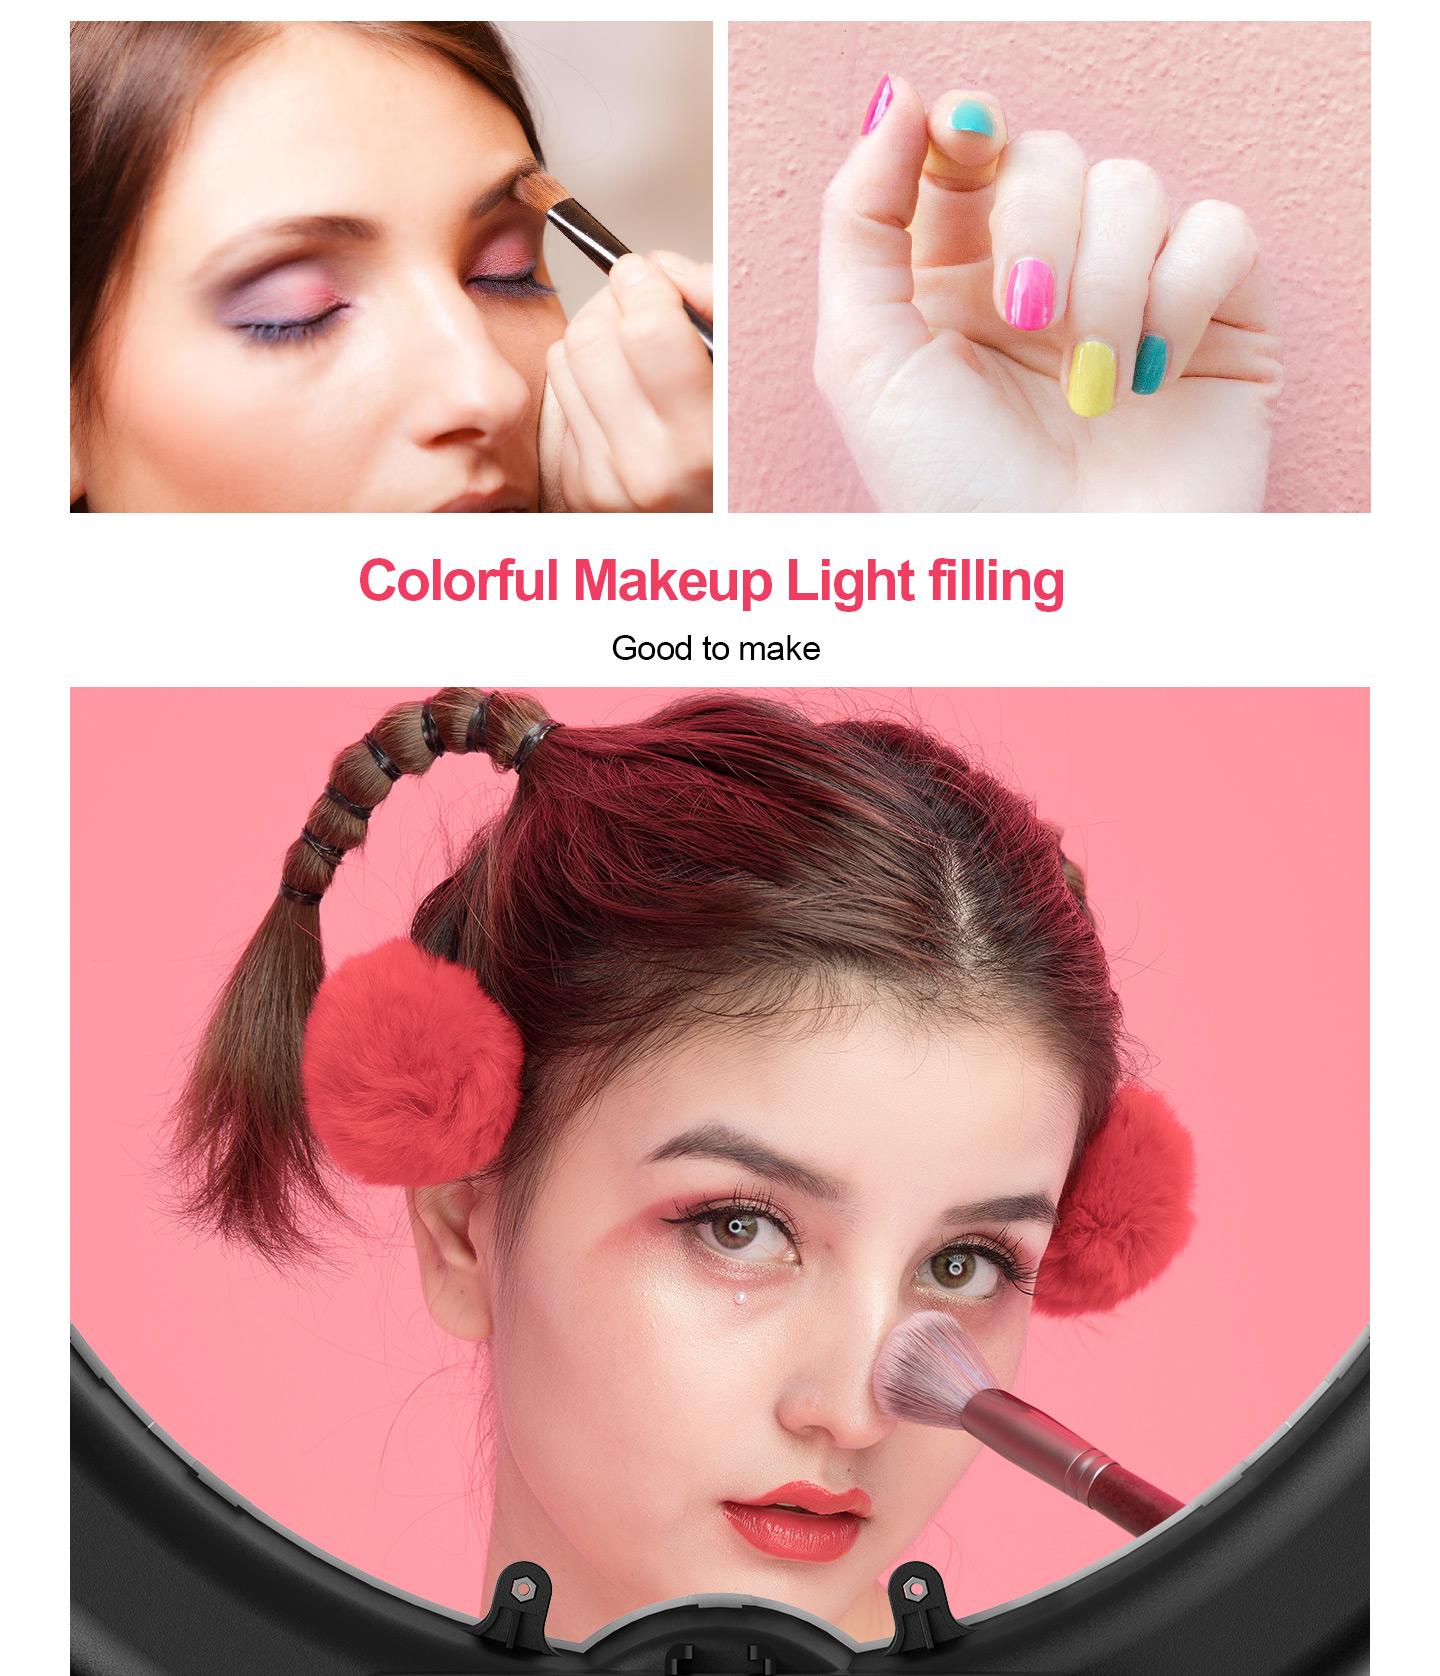 Colorful Makeup Light filling